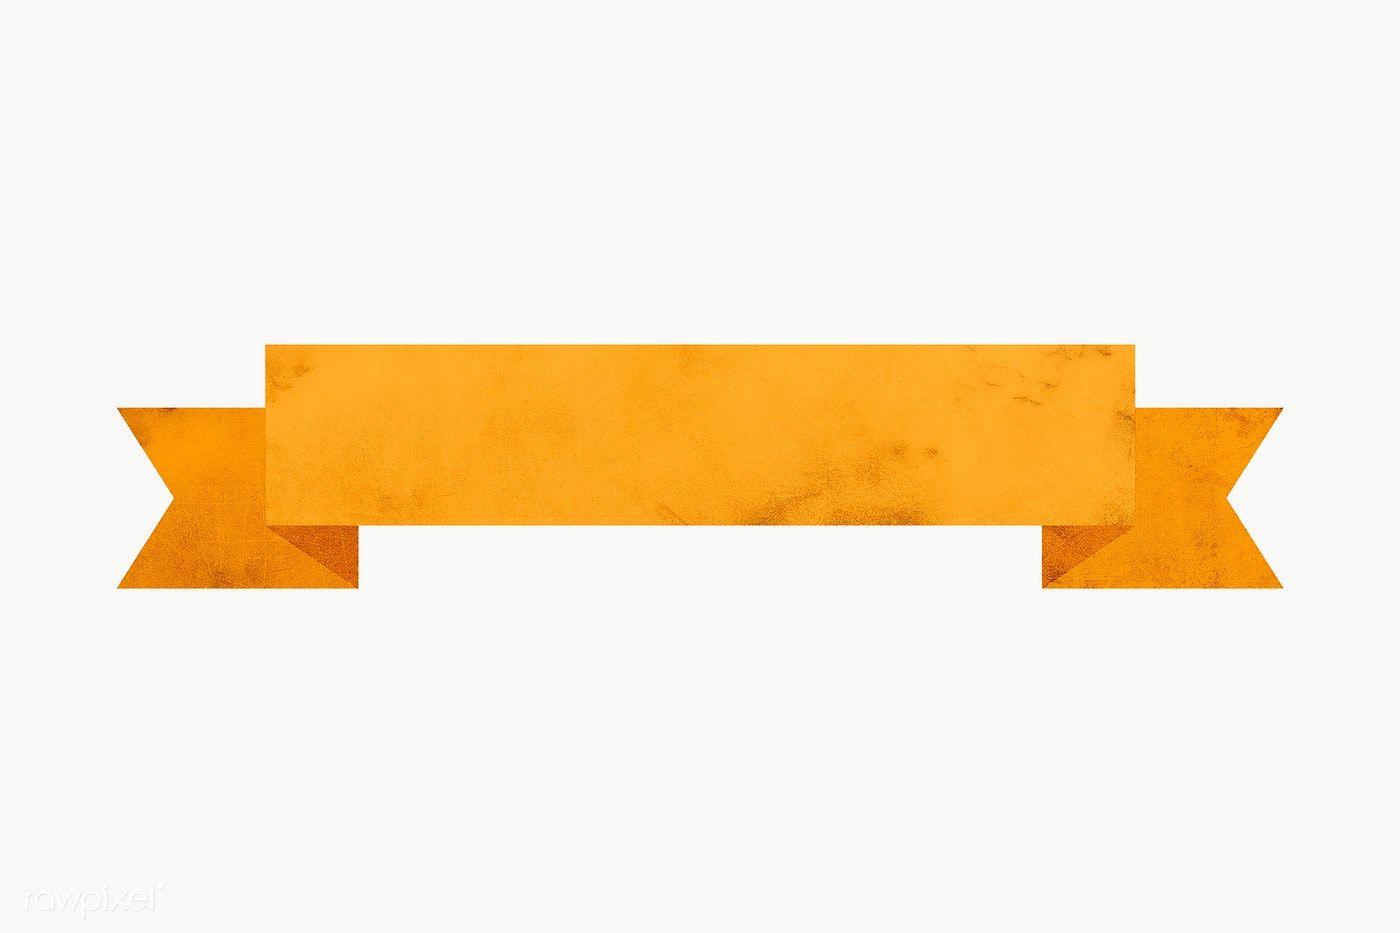 Yellow Paper Ribbon Banner Design Element Free Image By Rawpixel Com Sasi Banner Design Ribbon Banner Yellow Paper